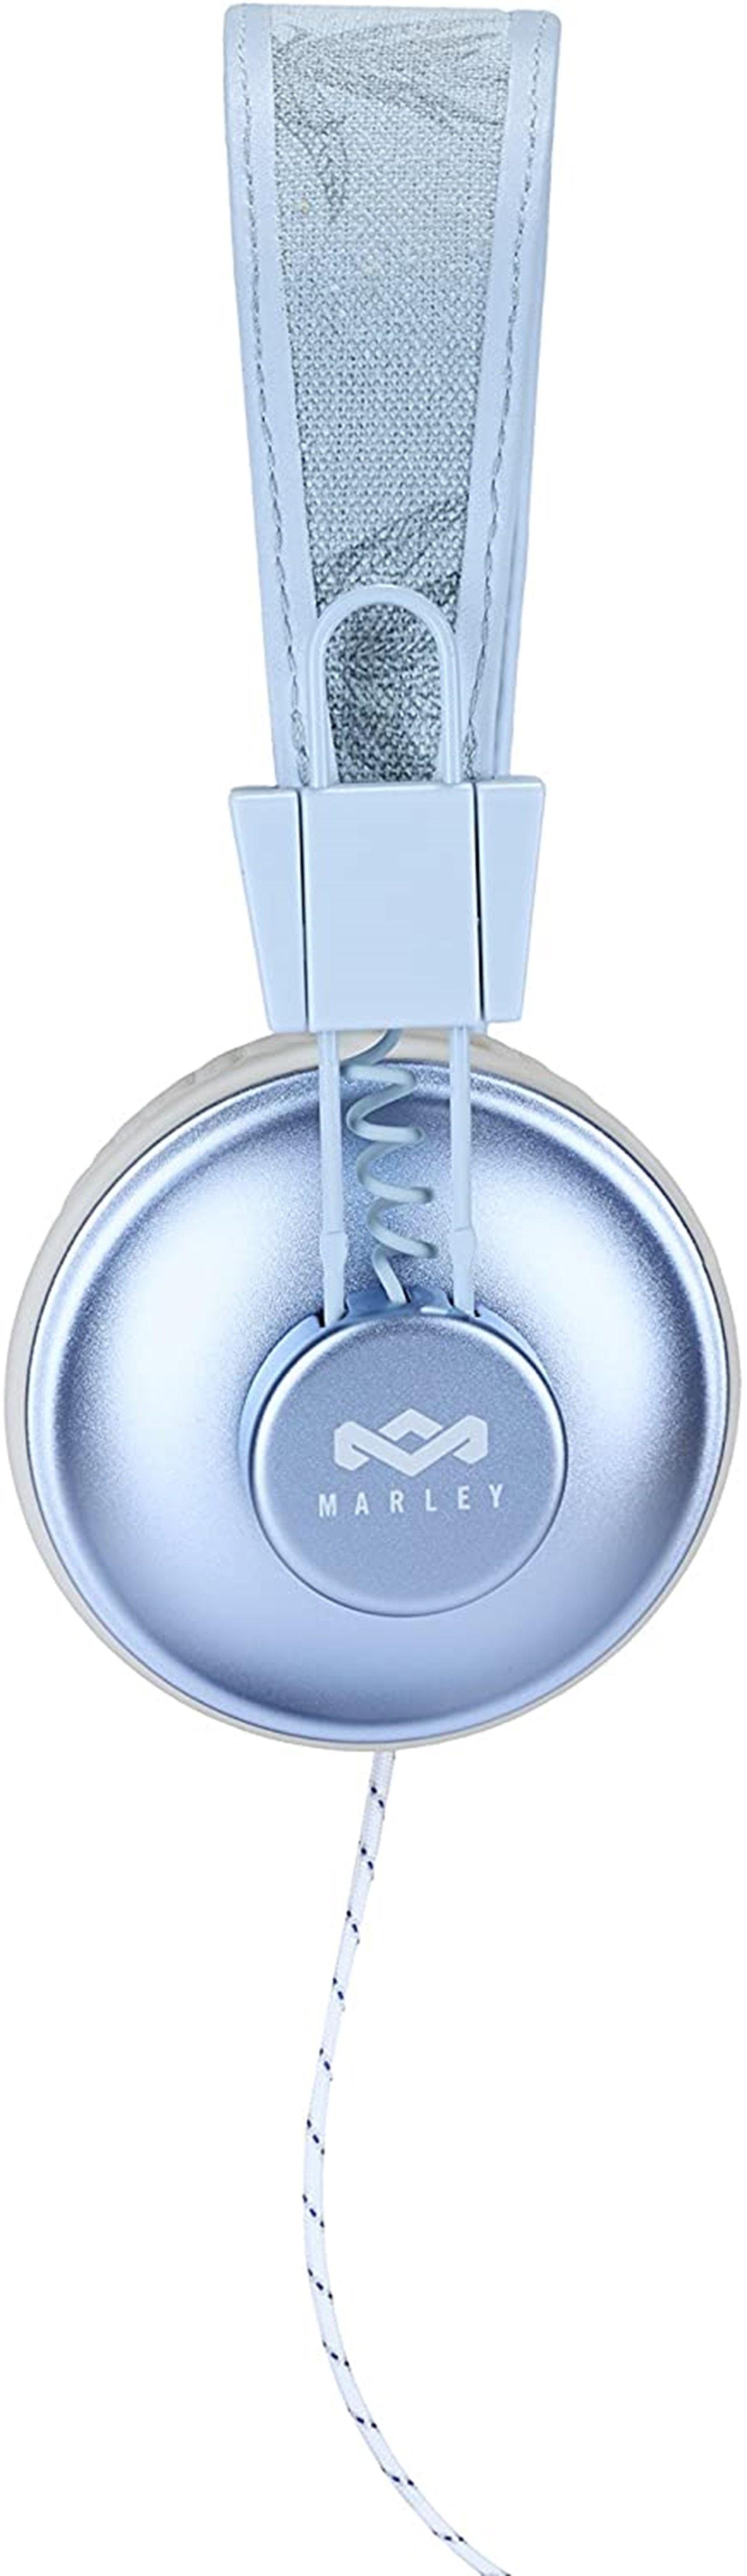 House Of Marley Positive Vibration Blue Hemp Headphones W/Mic (hmv Exclusive) - 3